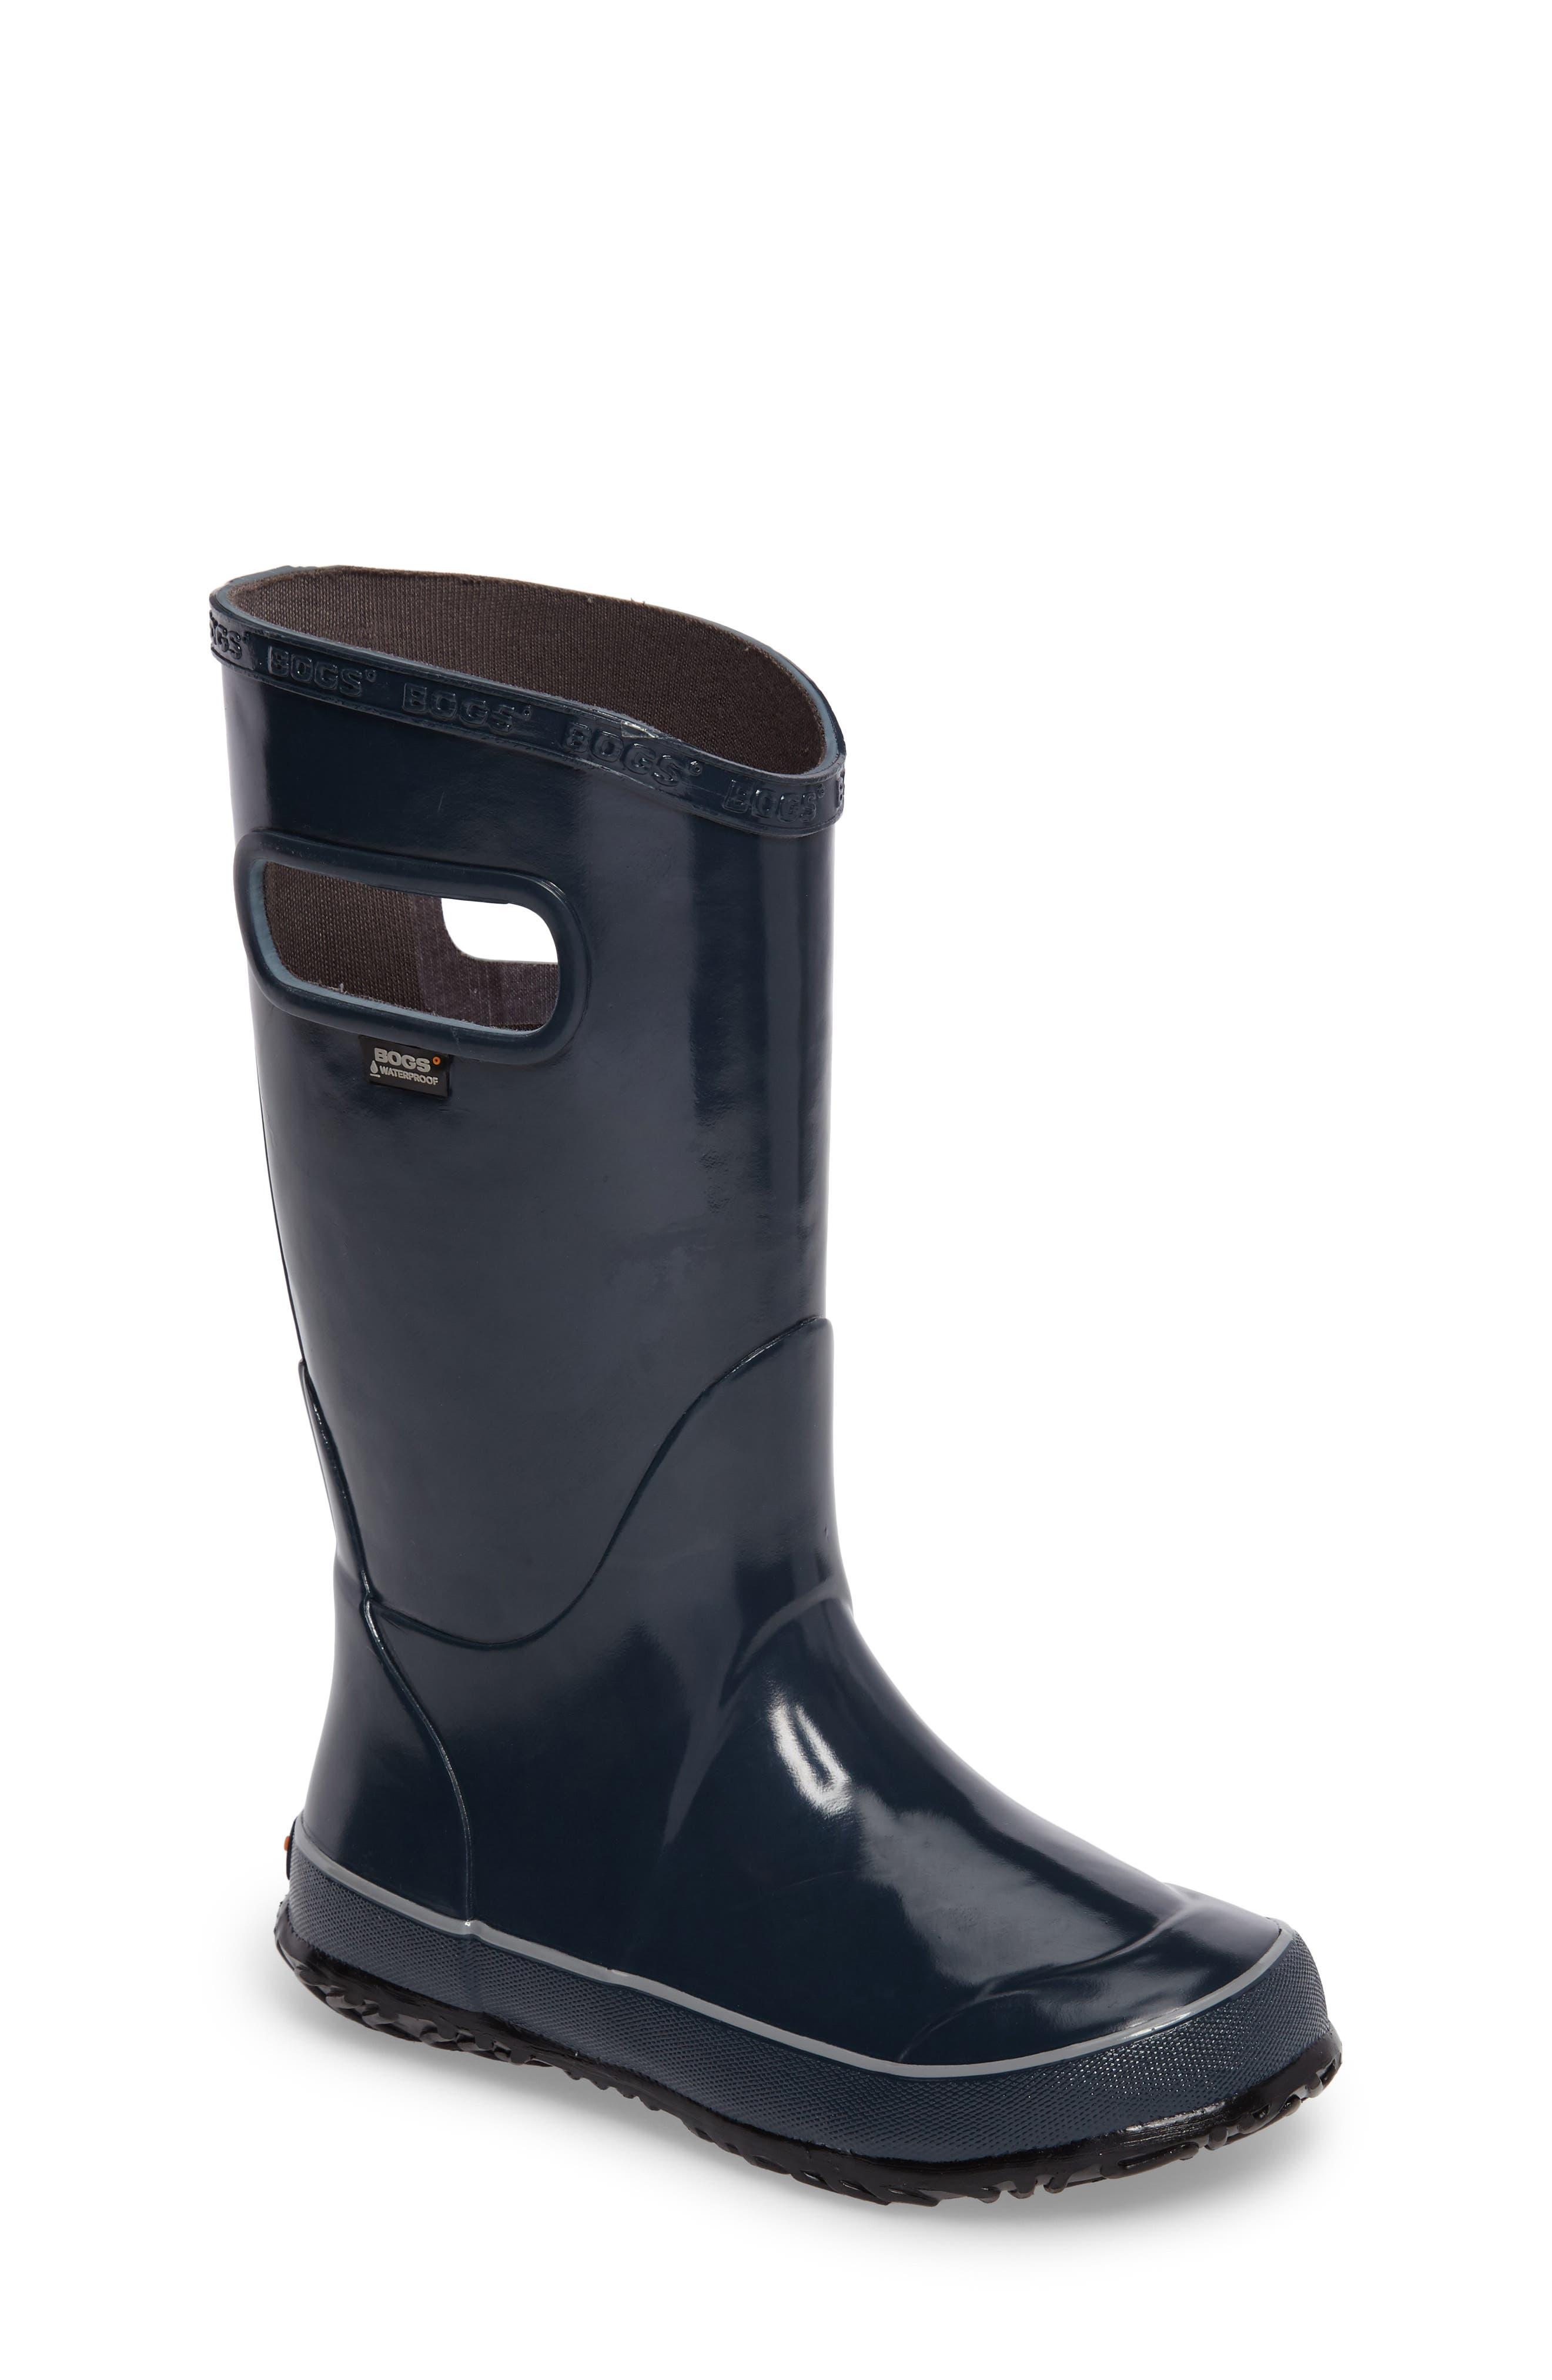 Bogs Solid Waterproof Rubber Rain Boot (Toddler, Little Kid & Big Kid)